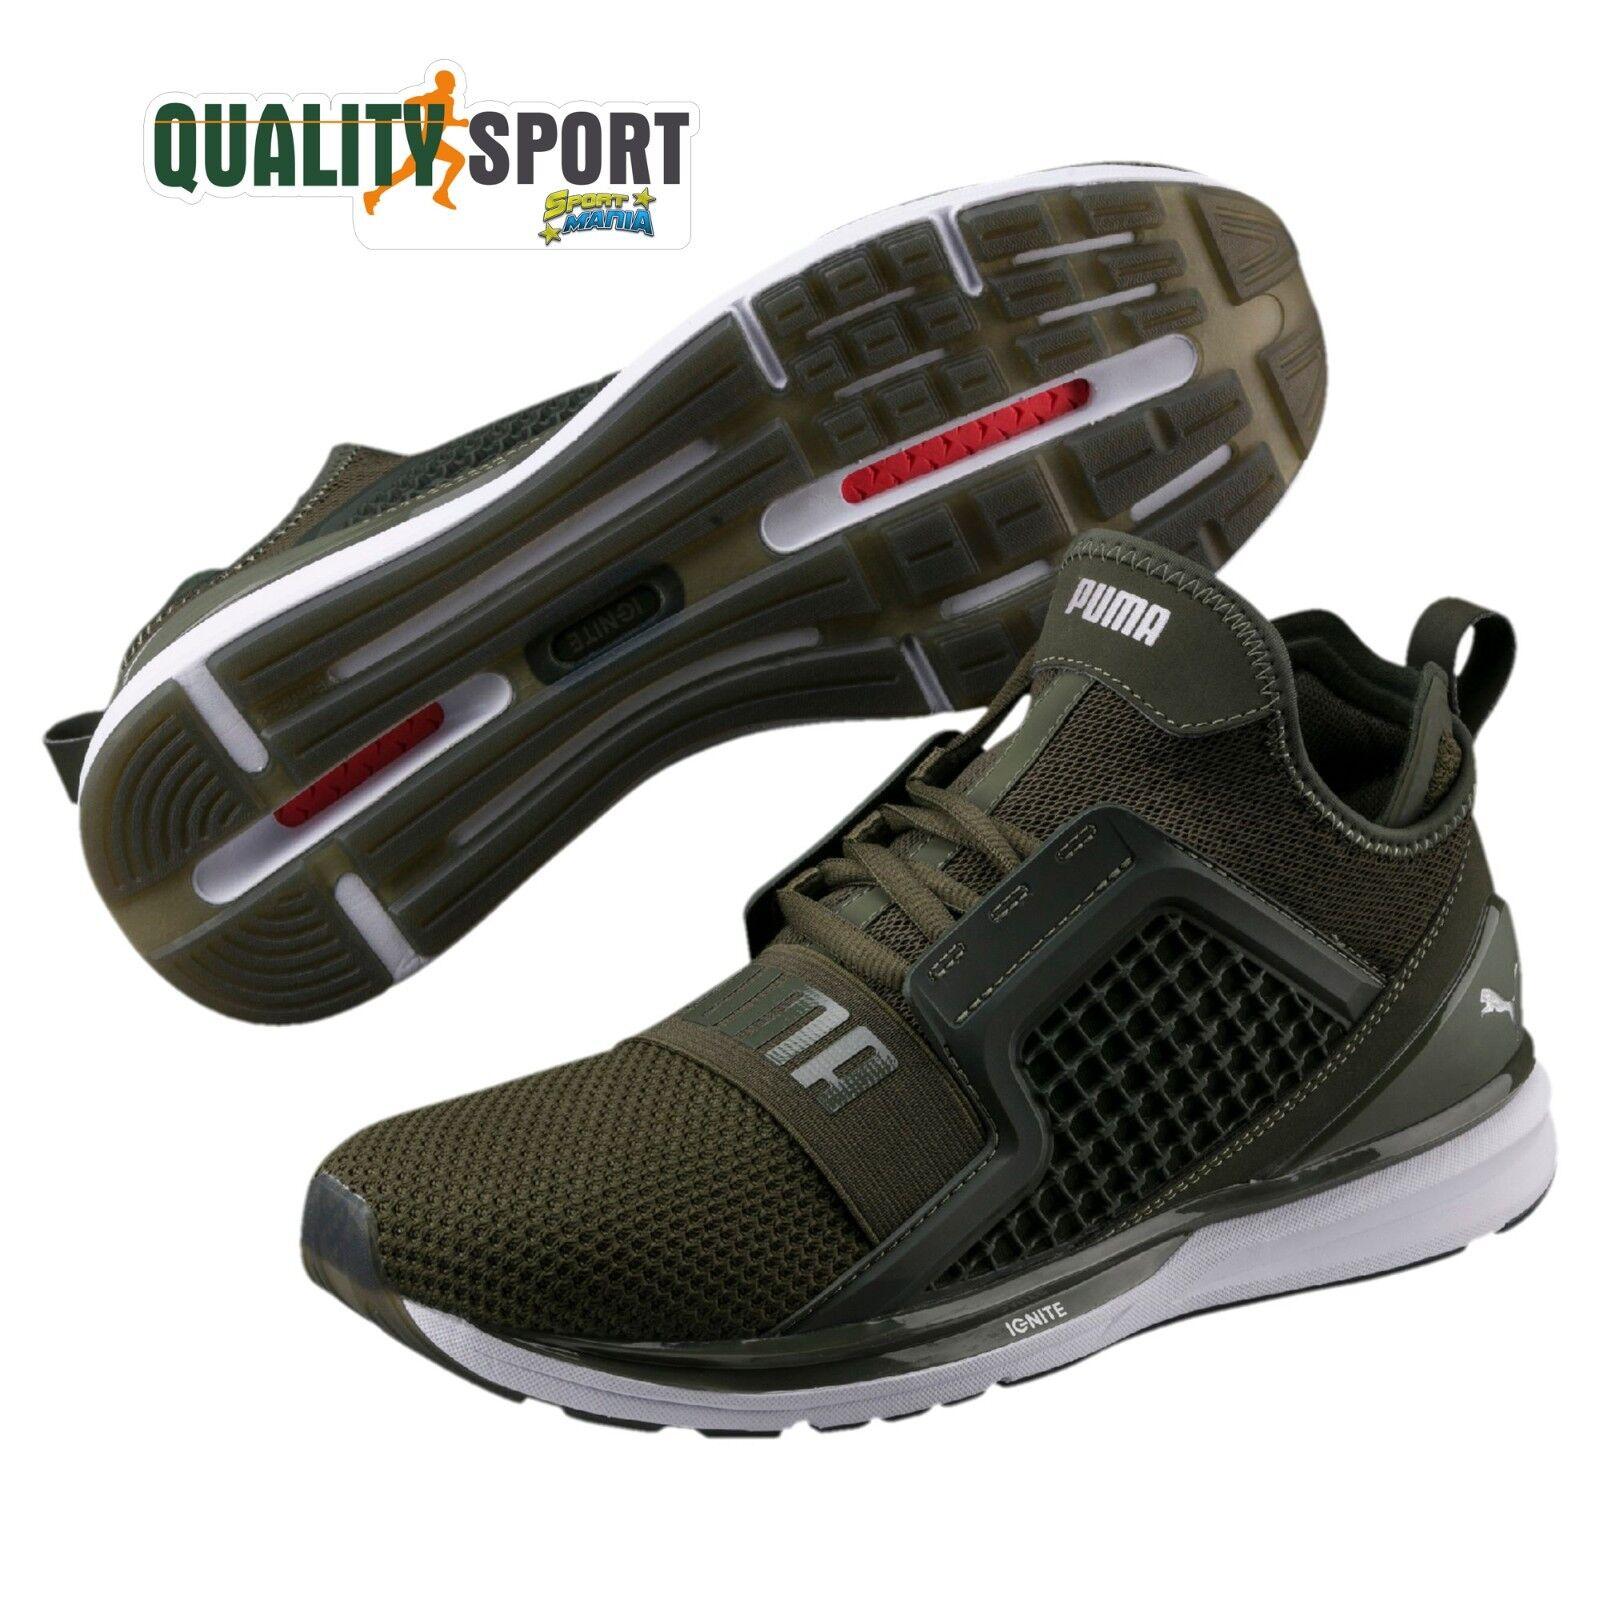 Puma Ignite  Limitless Weave Verdone Zapatos  Ignite hombre Deporteive 190503 01 2018 b12912